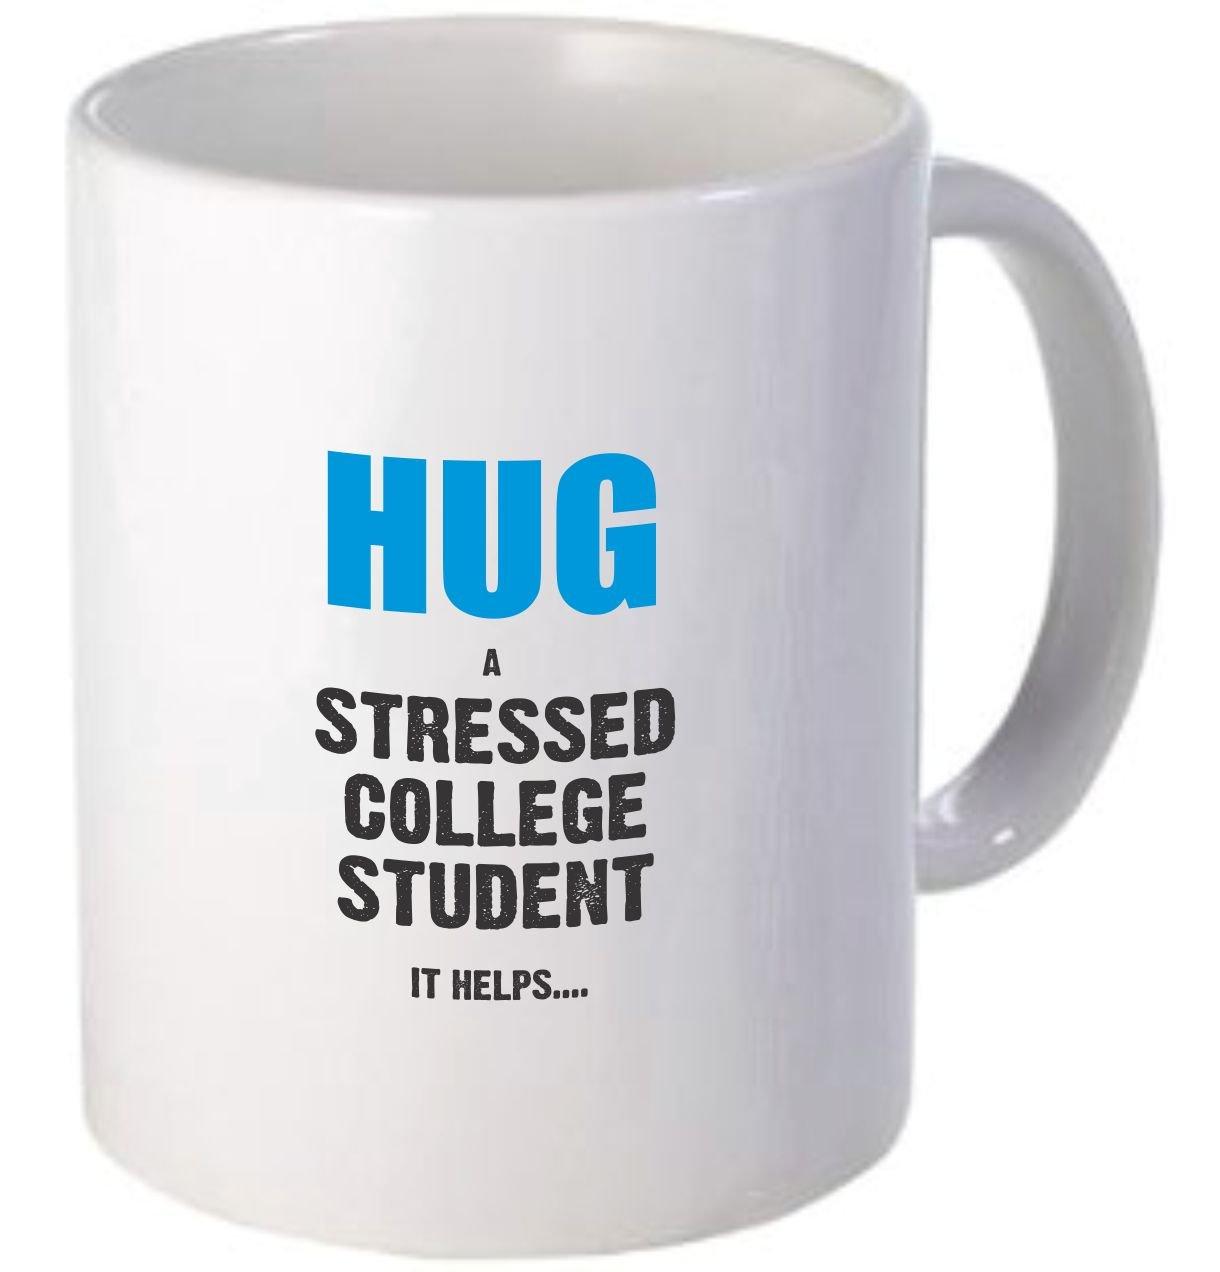 Rikki Knight CFS-Dis-3848 Hug a Stressed College Student Blue Design Funny Quotes Design Ceramic Coffee Mug Cups, 11 oz, White